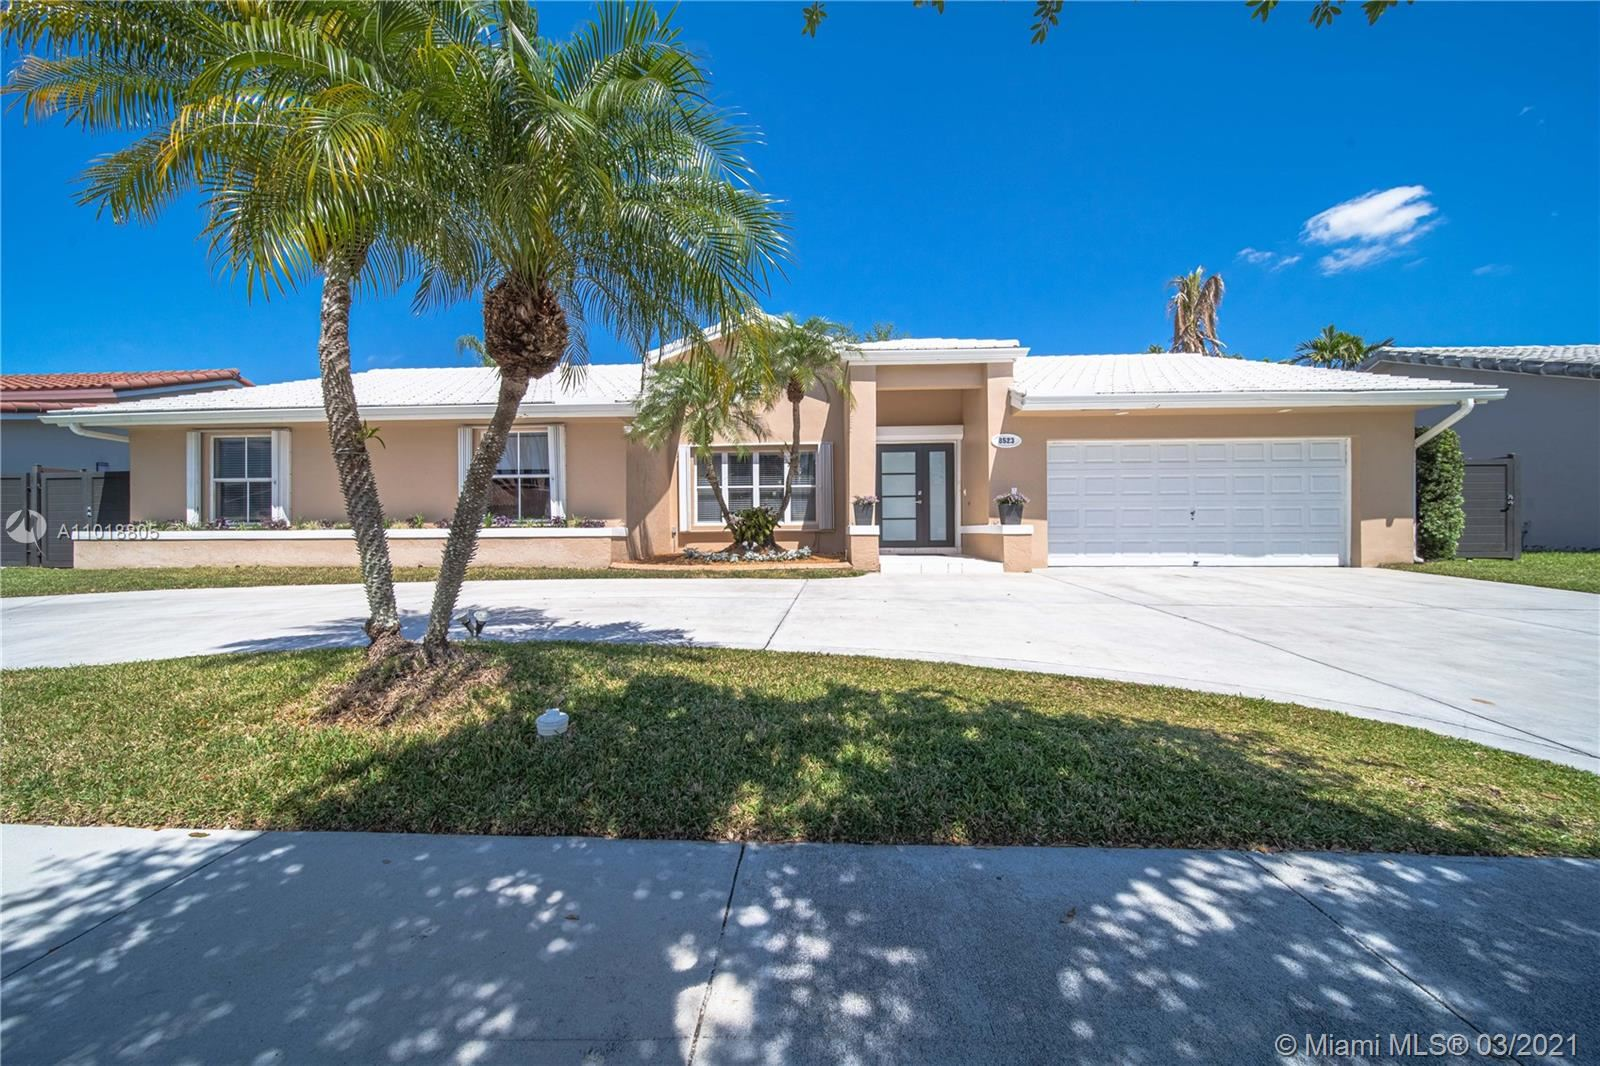 8523 SW 83rd St, Miami, FL 33143 - #: A11018805